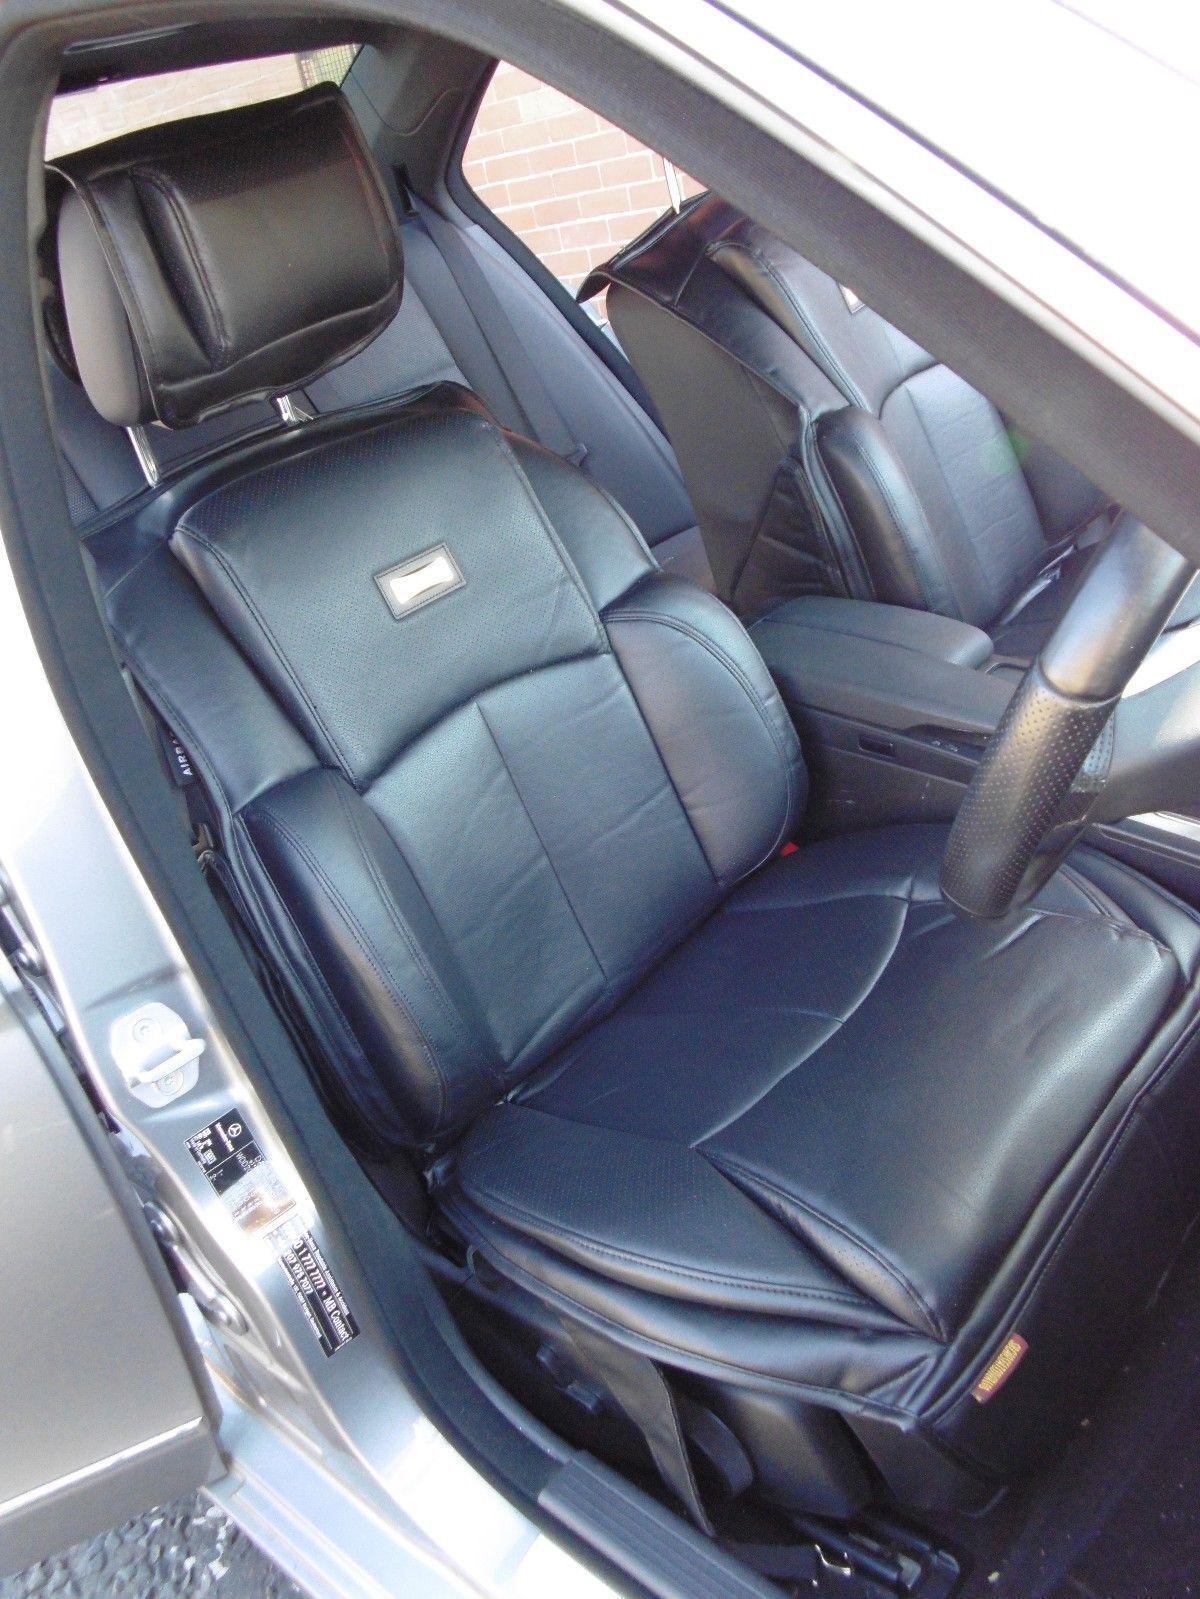 I Sitzbezüge passend für Mitsubishi Pajero Auto Luxus Wasserdicht grau,